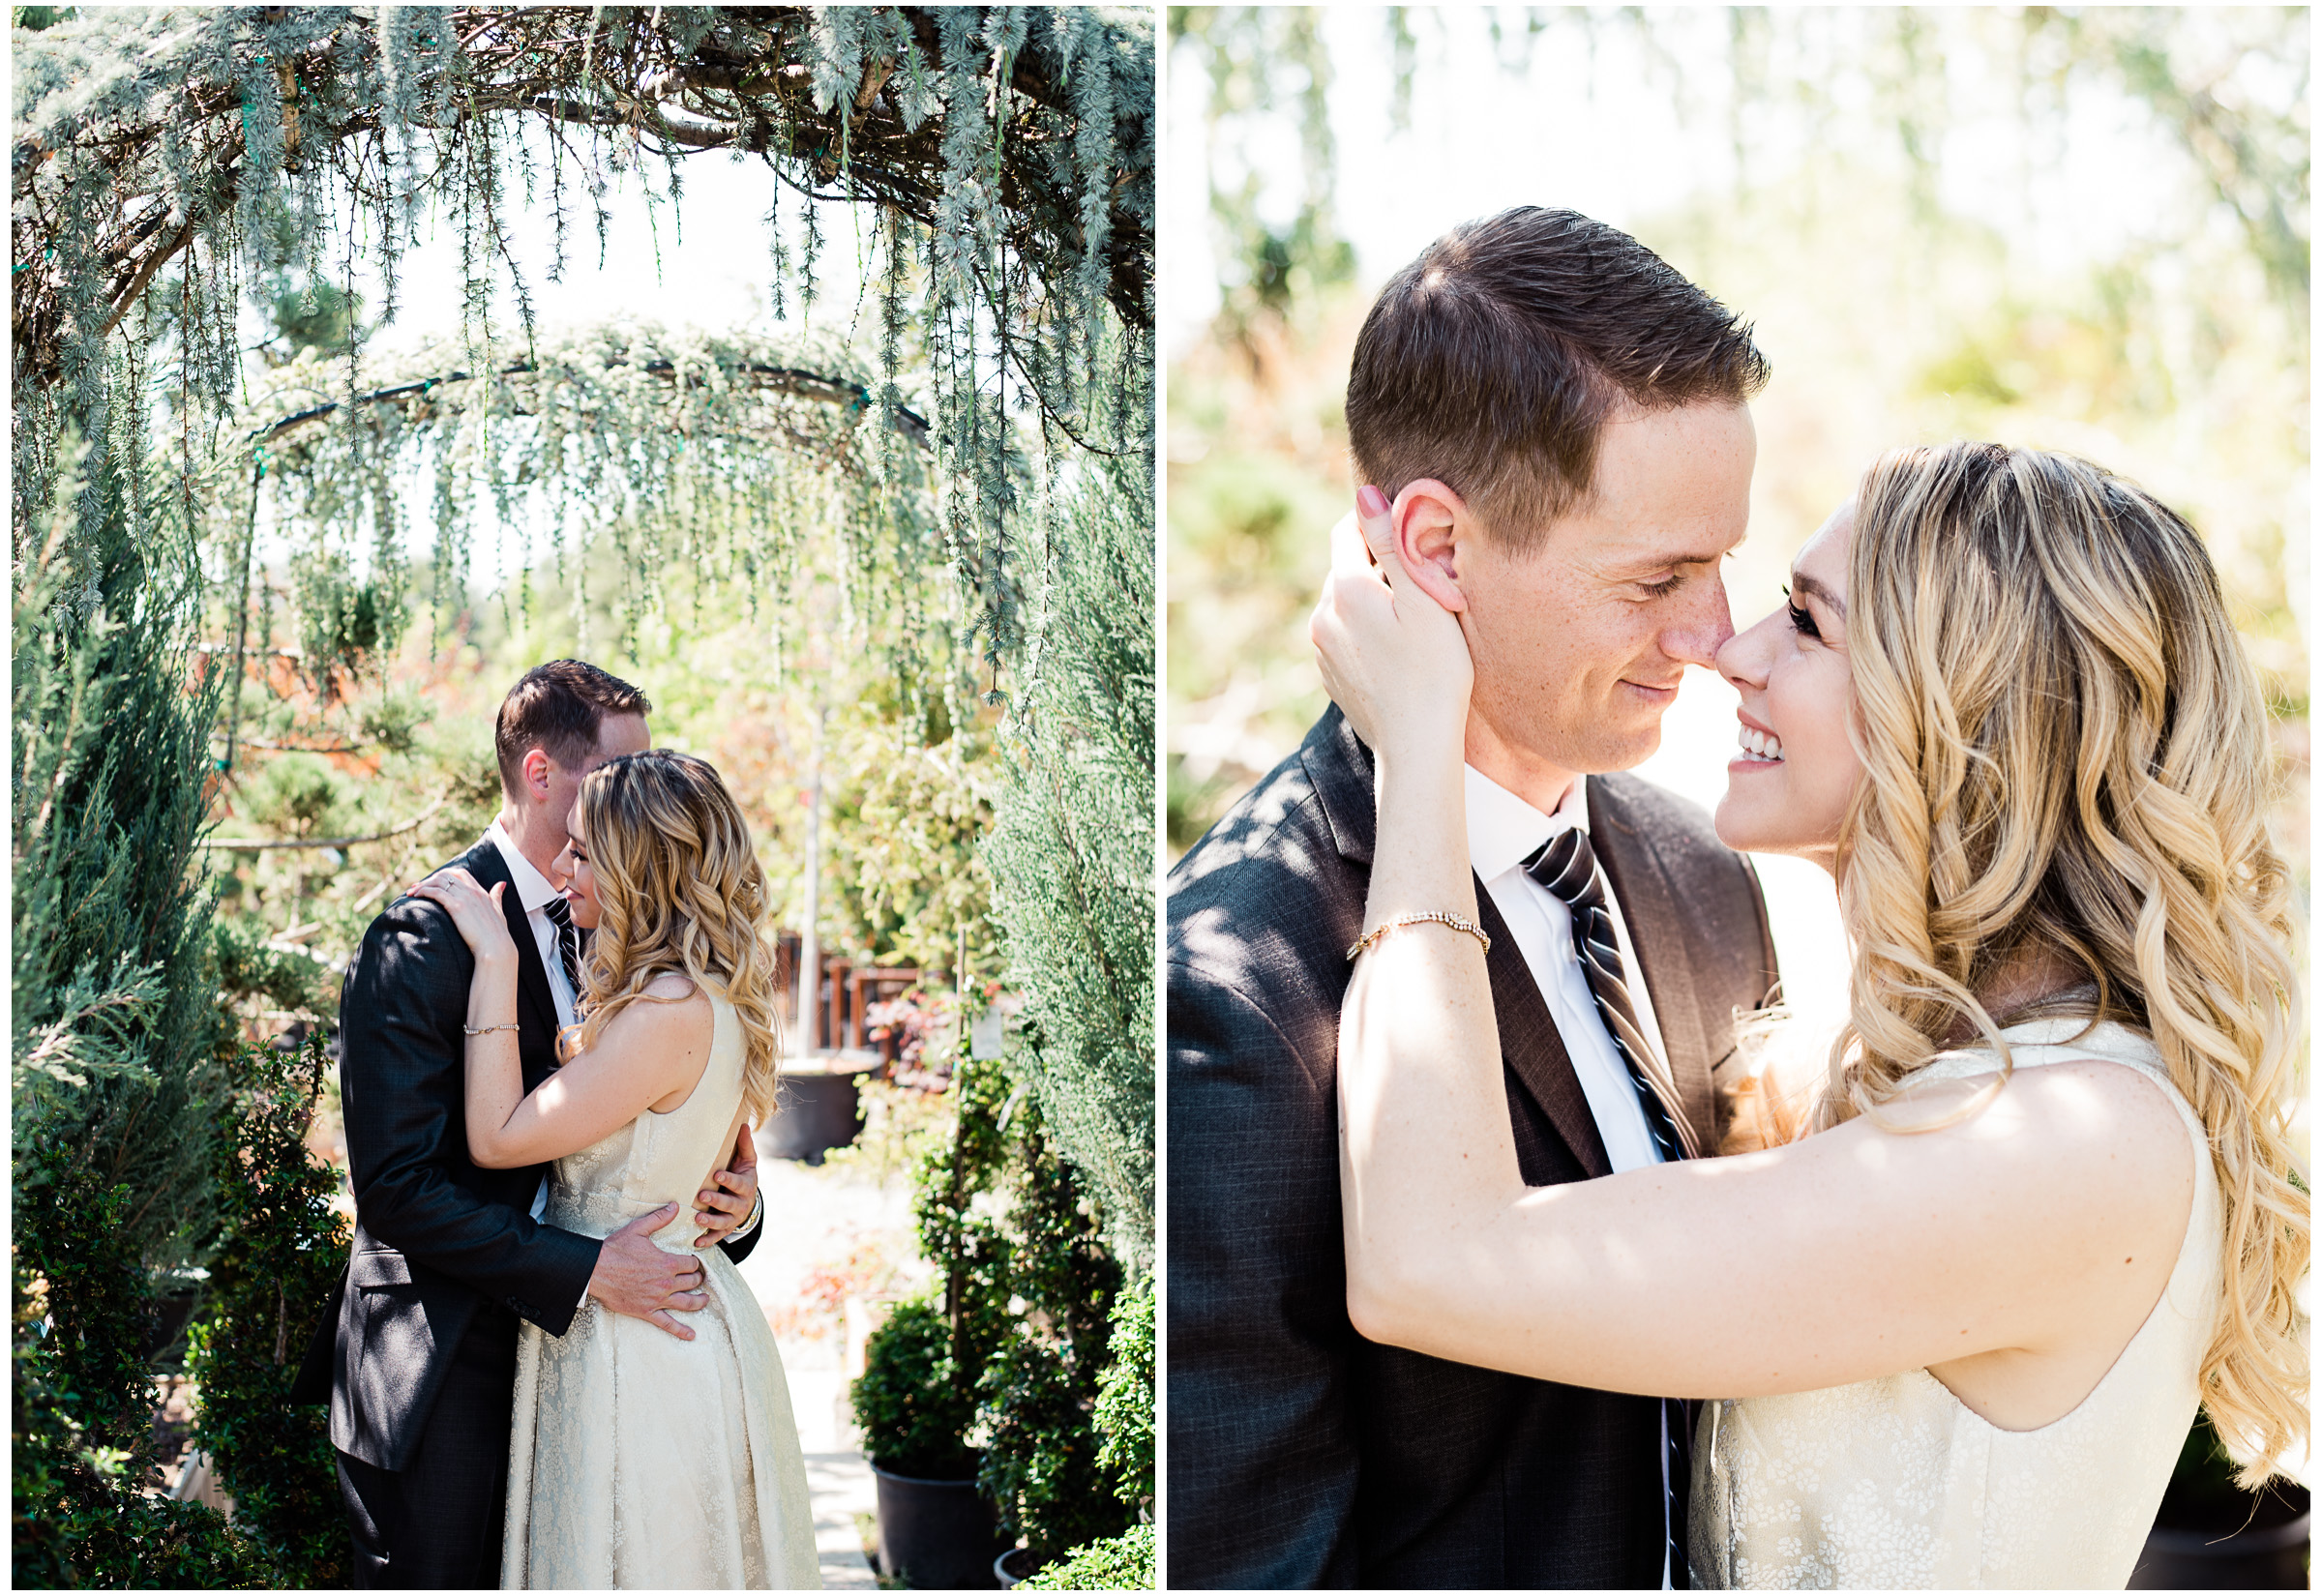 Loomis Wedding - Sacramento Photographer - Blue Goose - Justin Wilcox Photography - 9.jpg